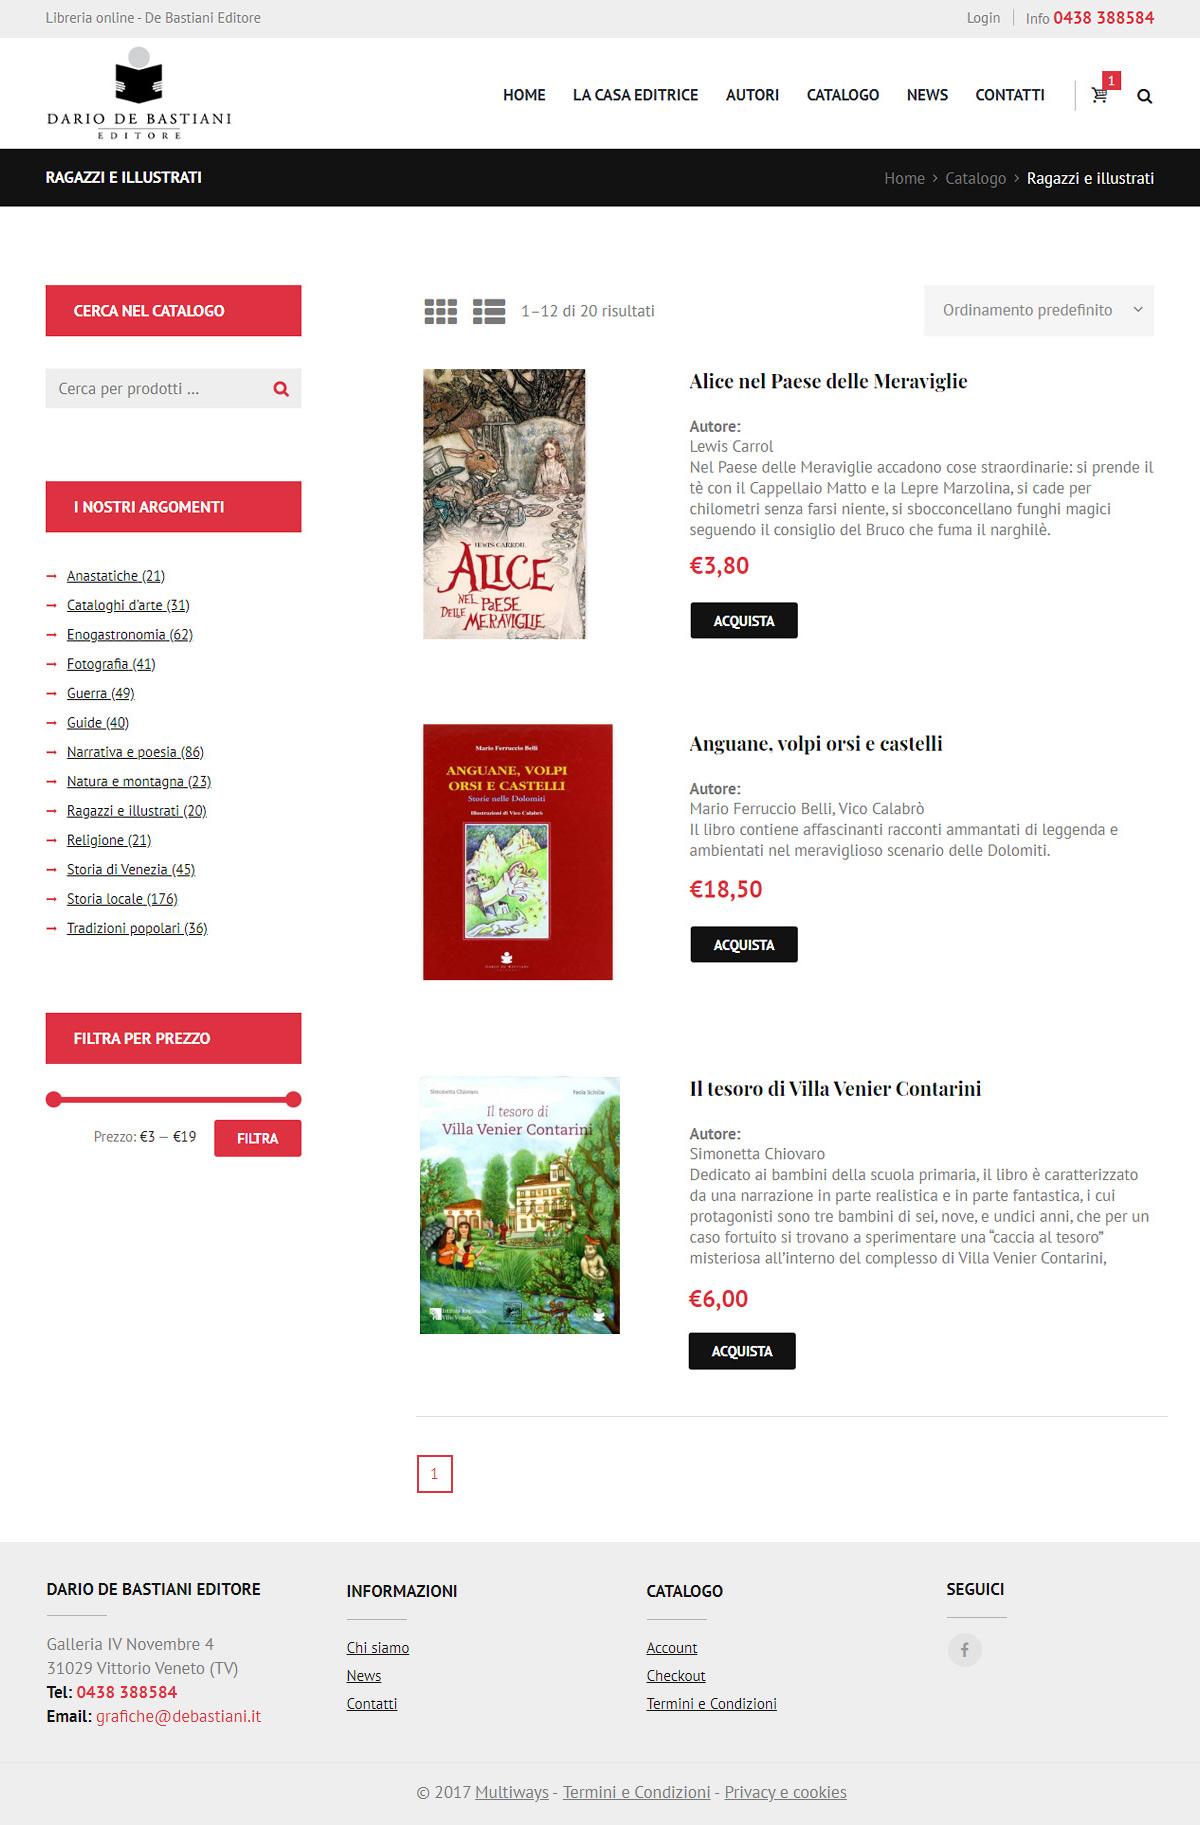 Catalogo De Bastiani